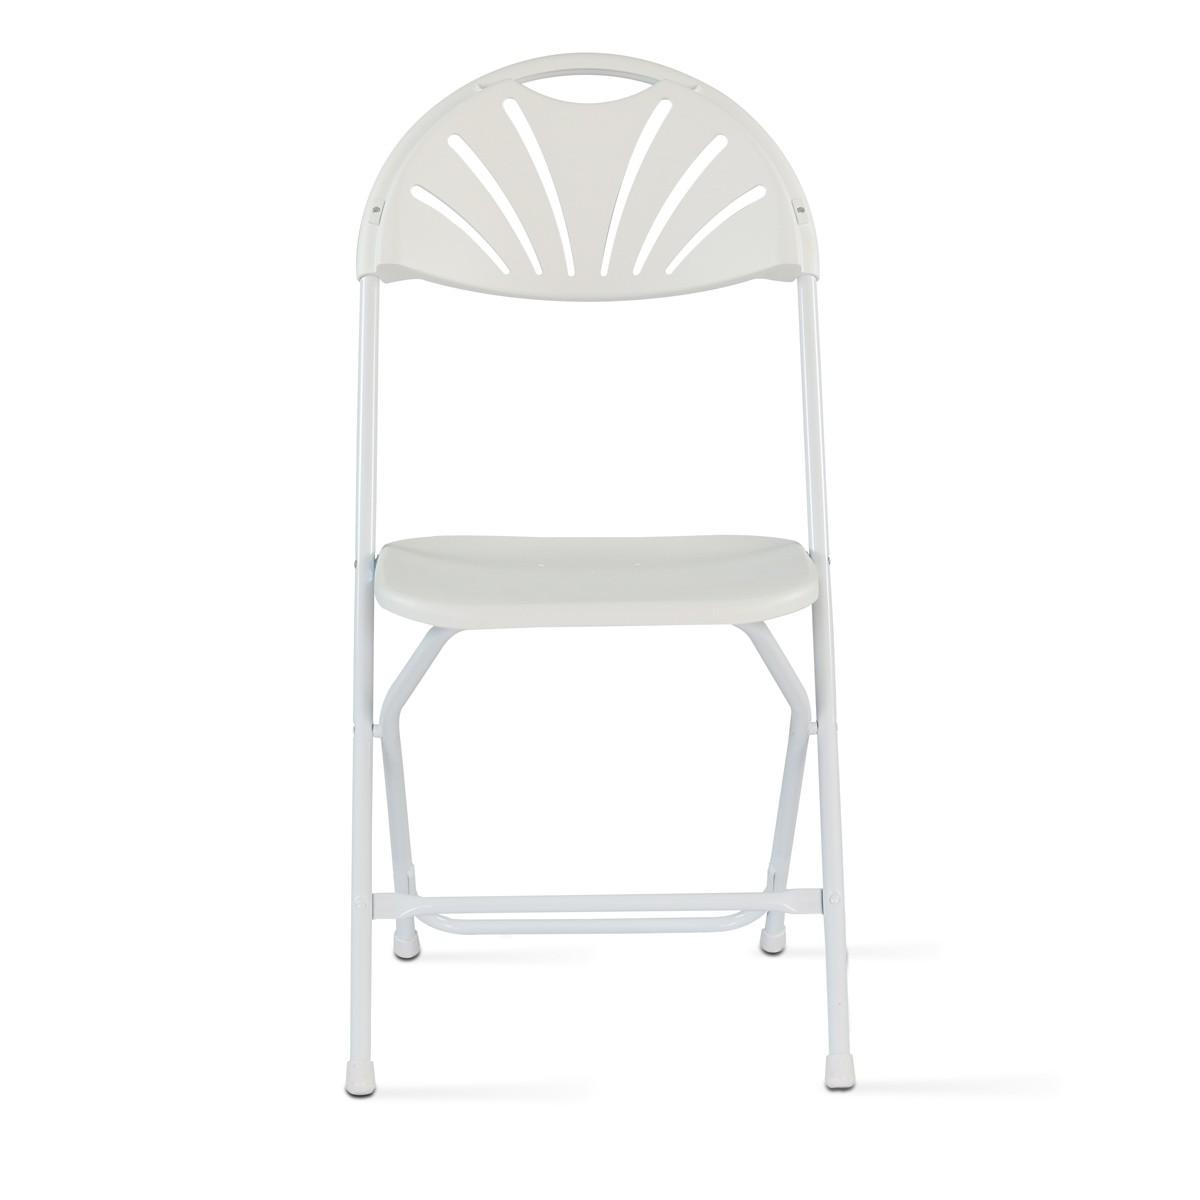 blanche en plastiqueMOBEVENTPROHellopro plastiqueMOBEVENTPROHellopro Chaise en pliante blanche Chaise pliante 76vYgybf